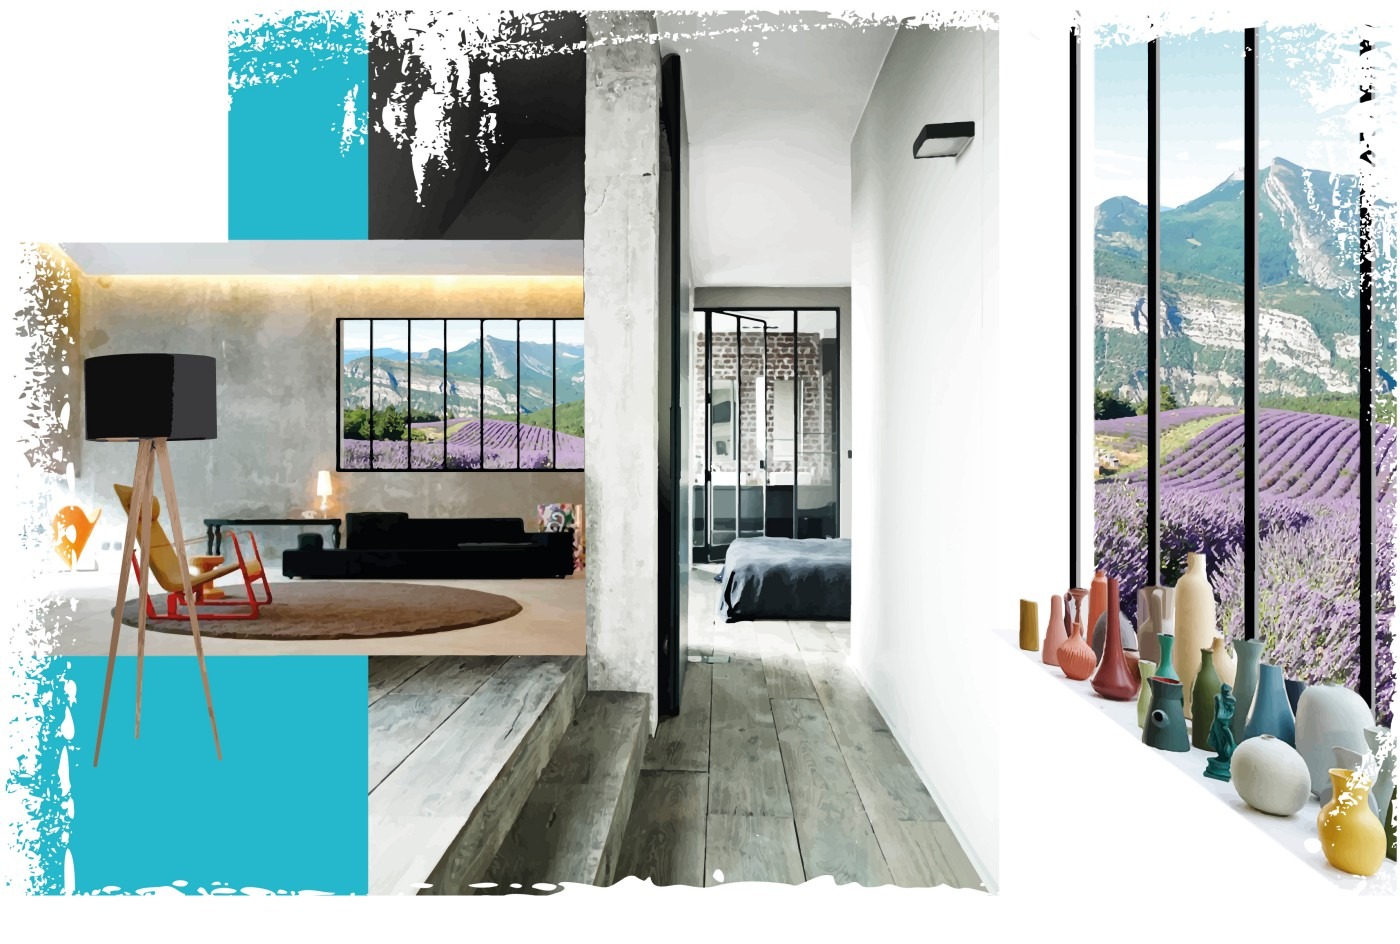 chassis cast pmr prix chassis cast pmr argenteuil merlin. Black Bedroom Furniture Sets. Home Design Ideas